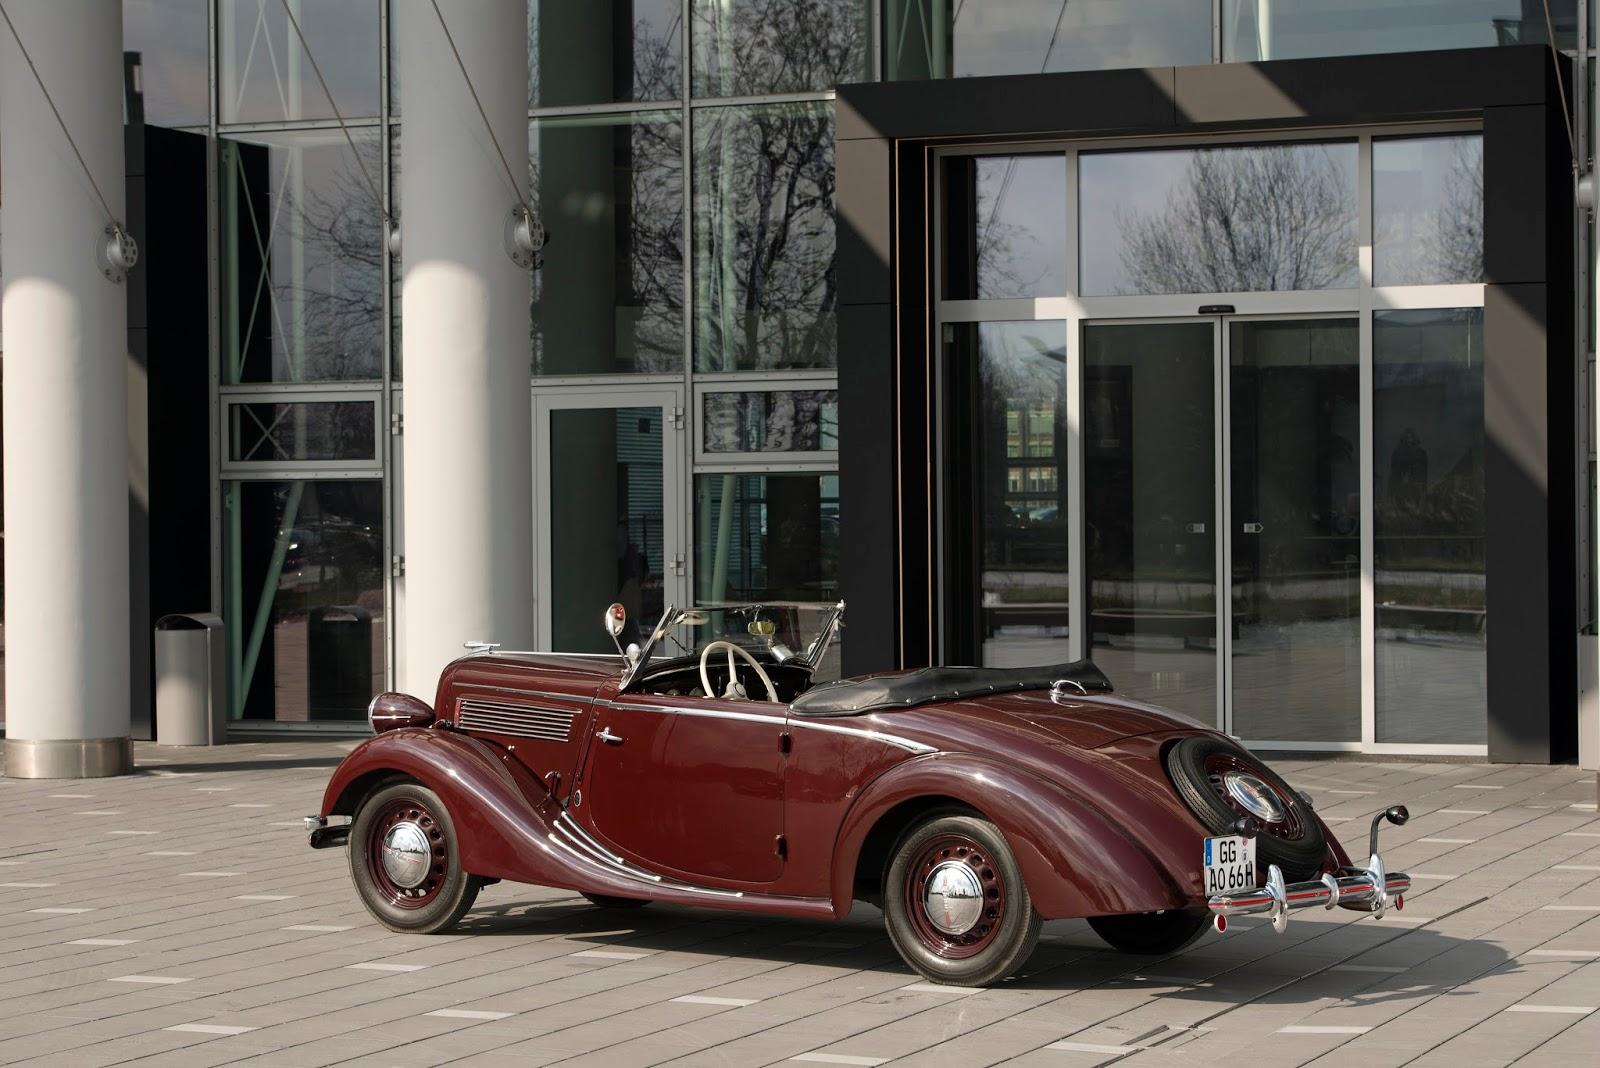 Opel Rallye Hessen Th25C325BCringen 301765 H Πλούσια Κληρονομιά των Opel Cabrio cabrio, Opel, Opel 8/25 hp, Opel Cascada, Opel Olympia, Opel Record, Opel Super 6